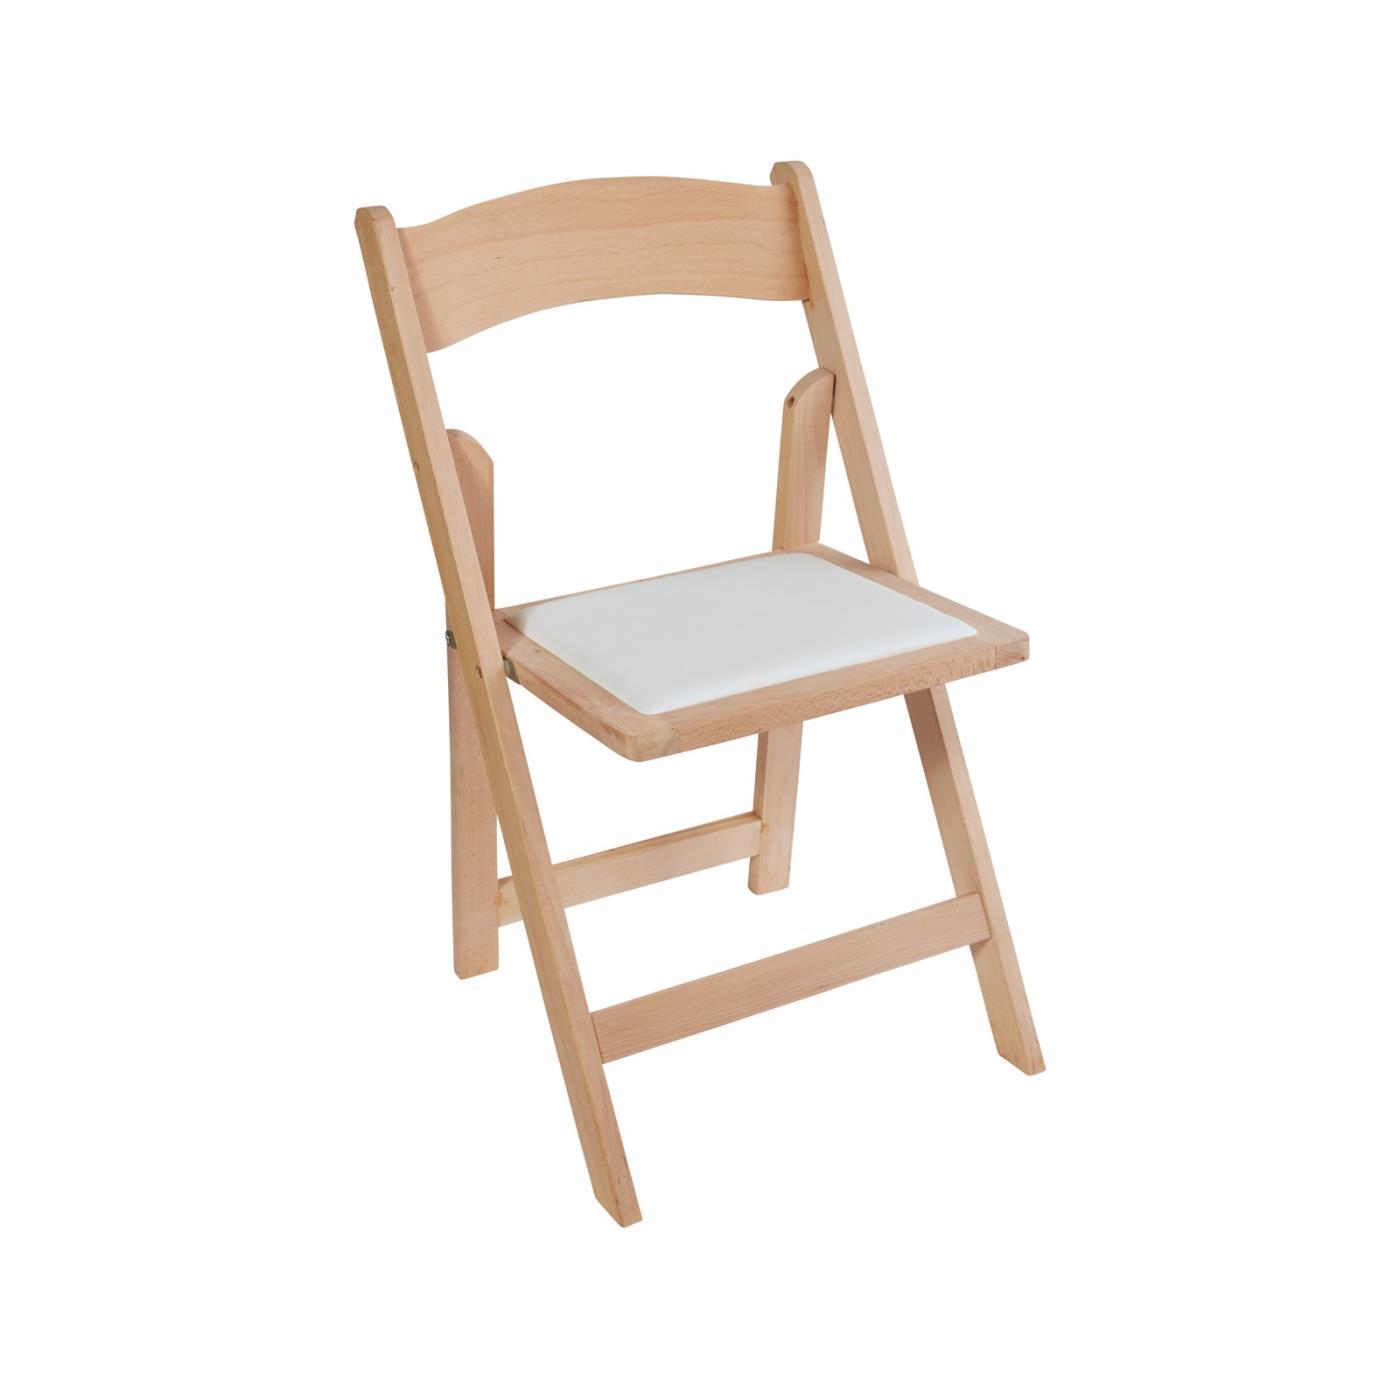 Wood Folding Chair - Raw